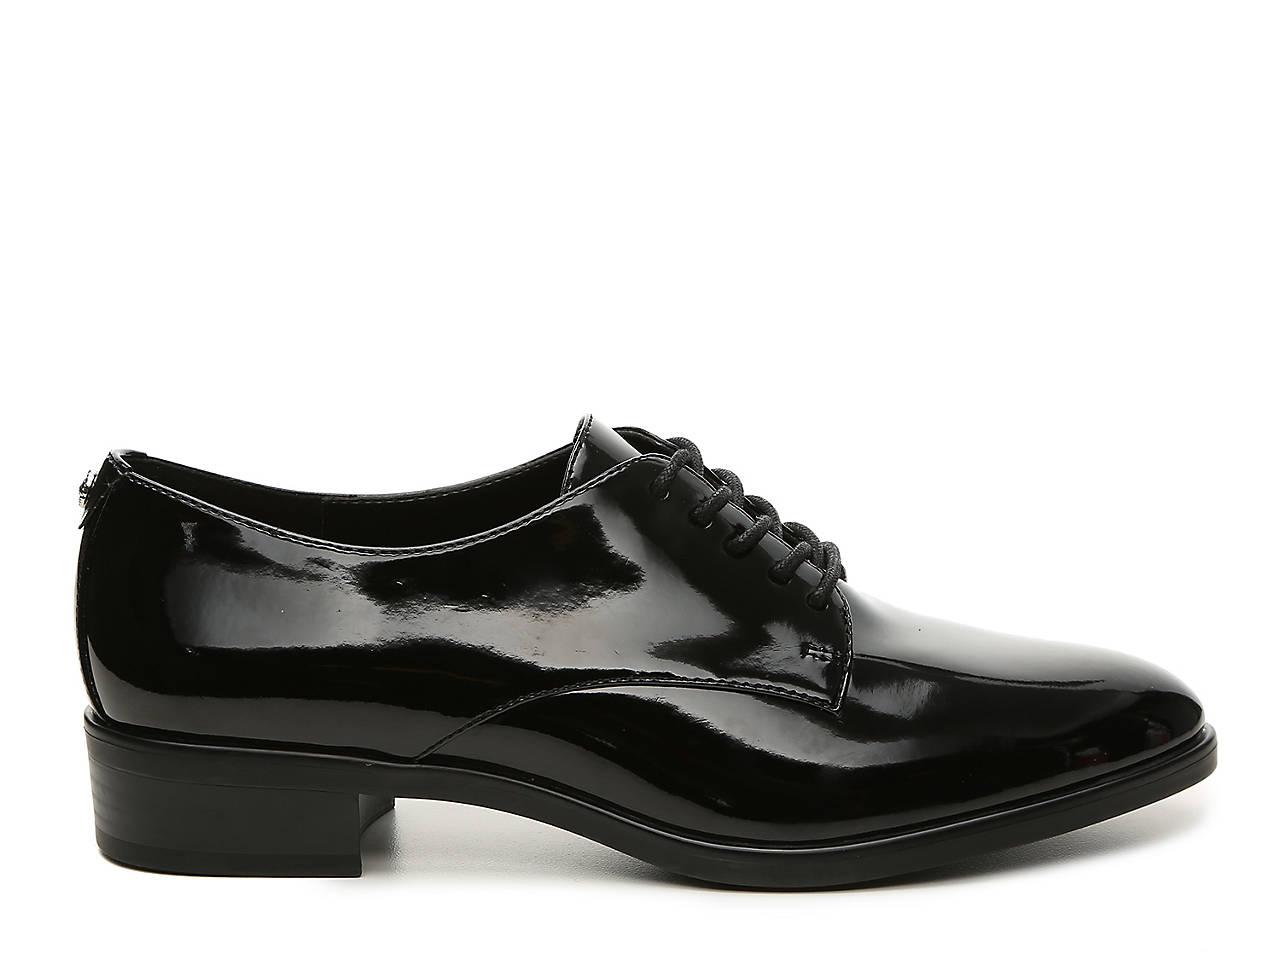 Anne Klein Lancy Oxford Women'S Shoes Dsw Calvin Klein Women'S Oxfords Shoes